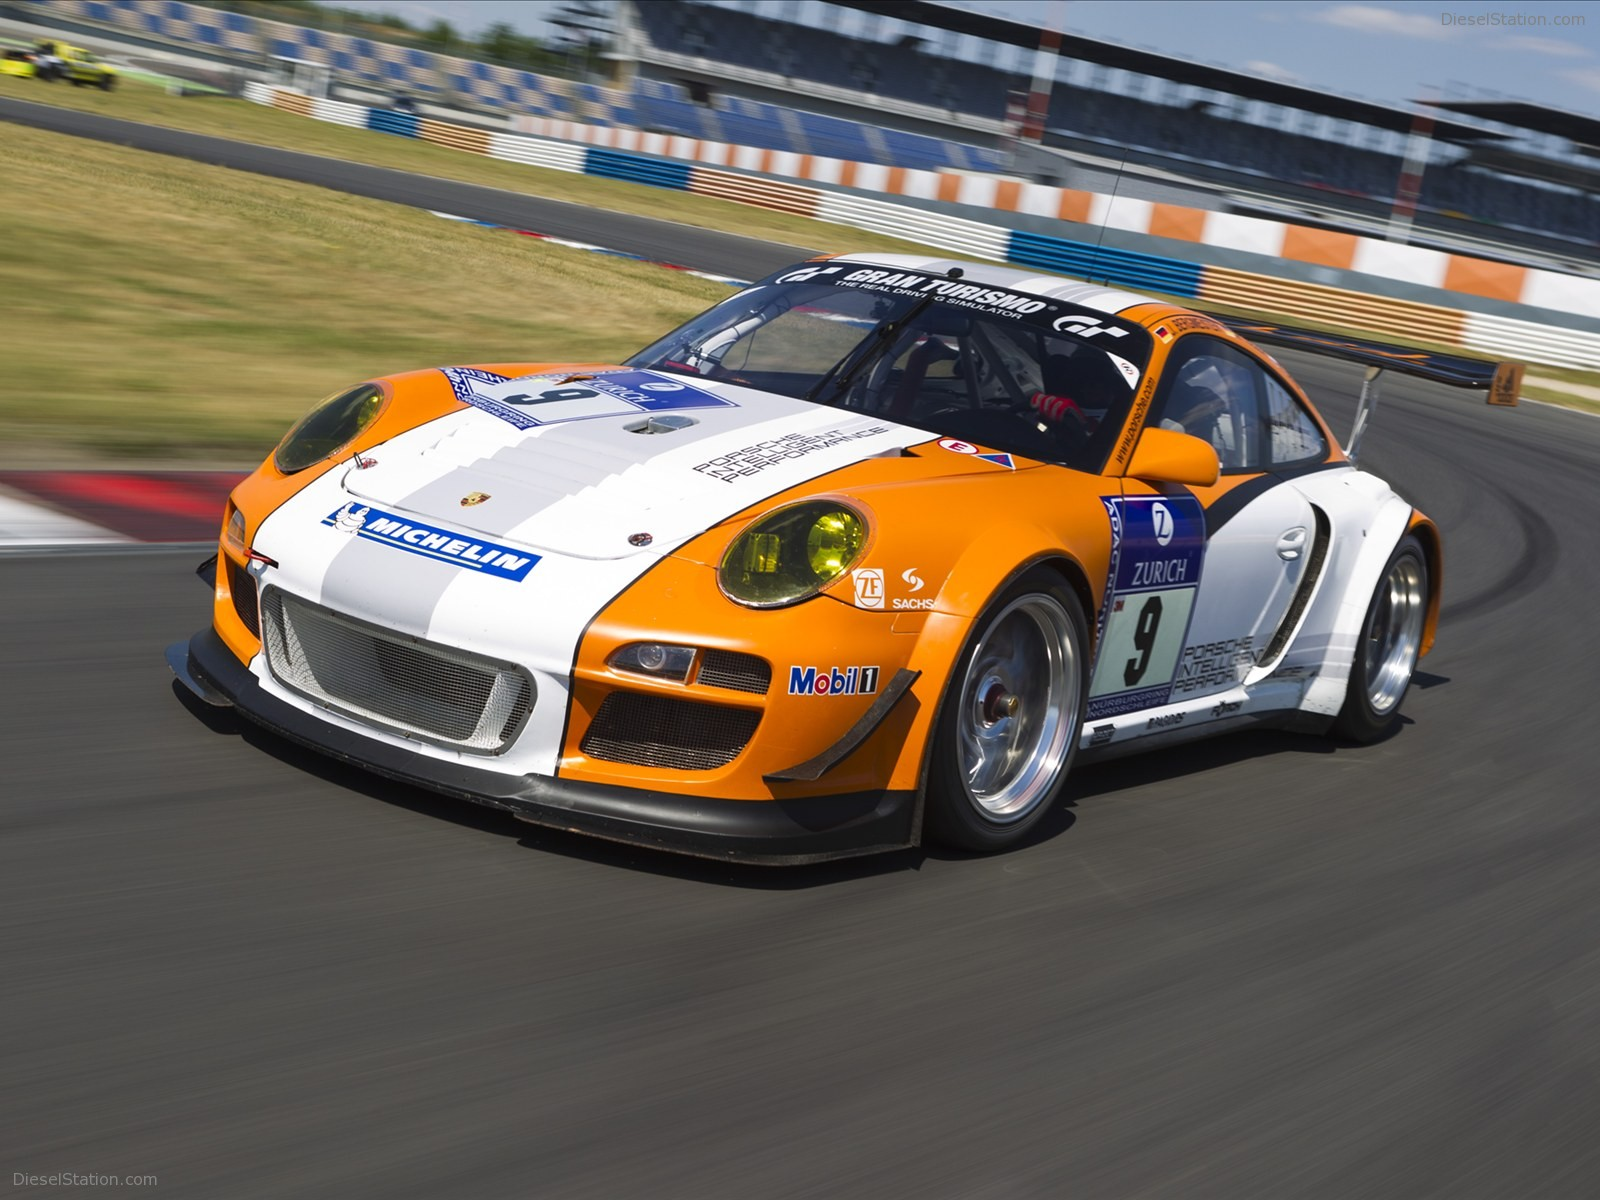 Porsche 911 GT3 R Hybrid at American Le Mans 2010 Exotic 1600x1200